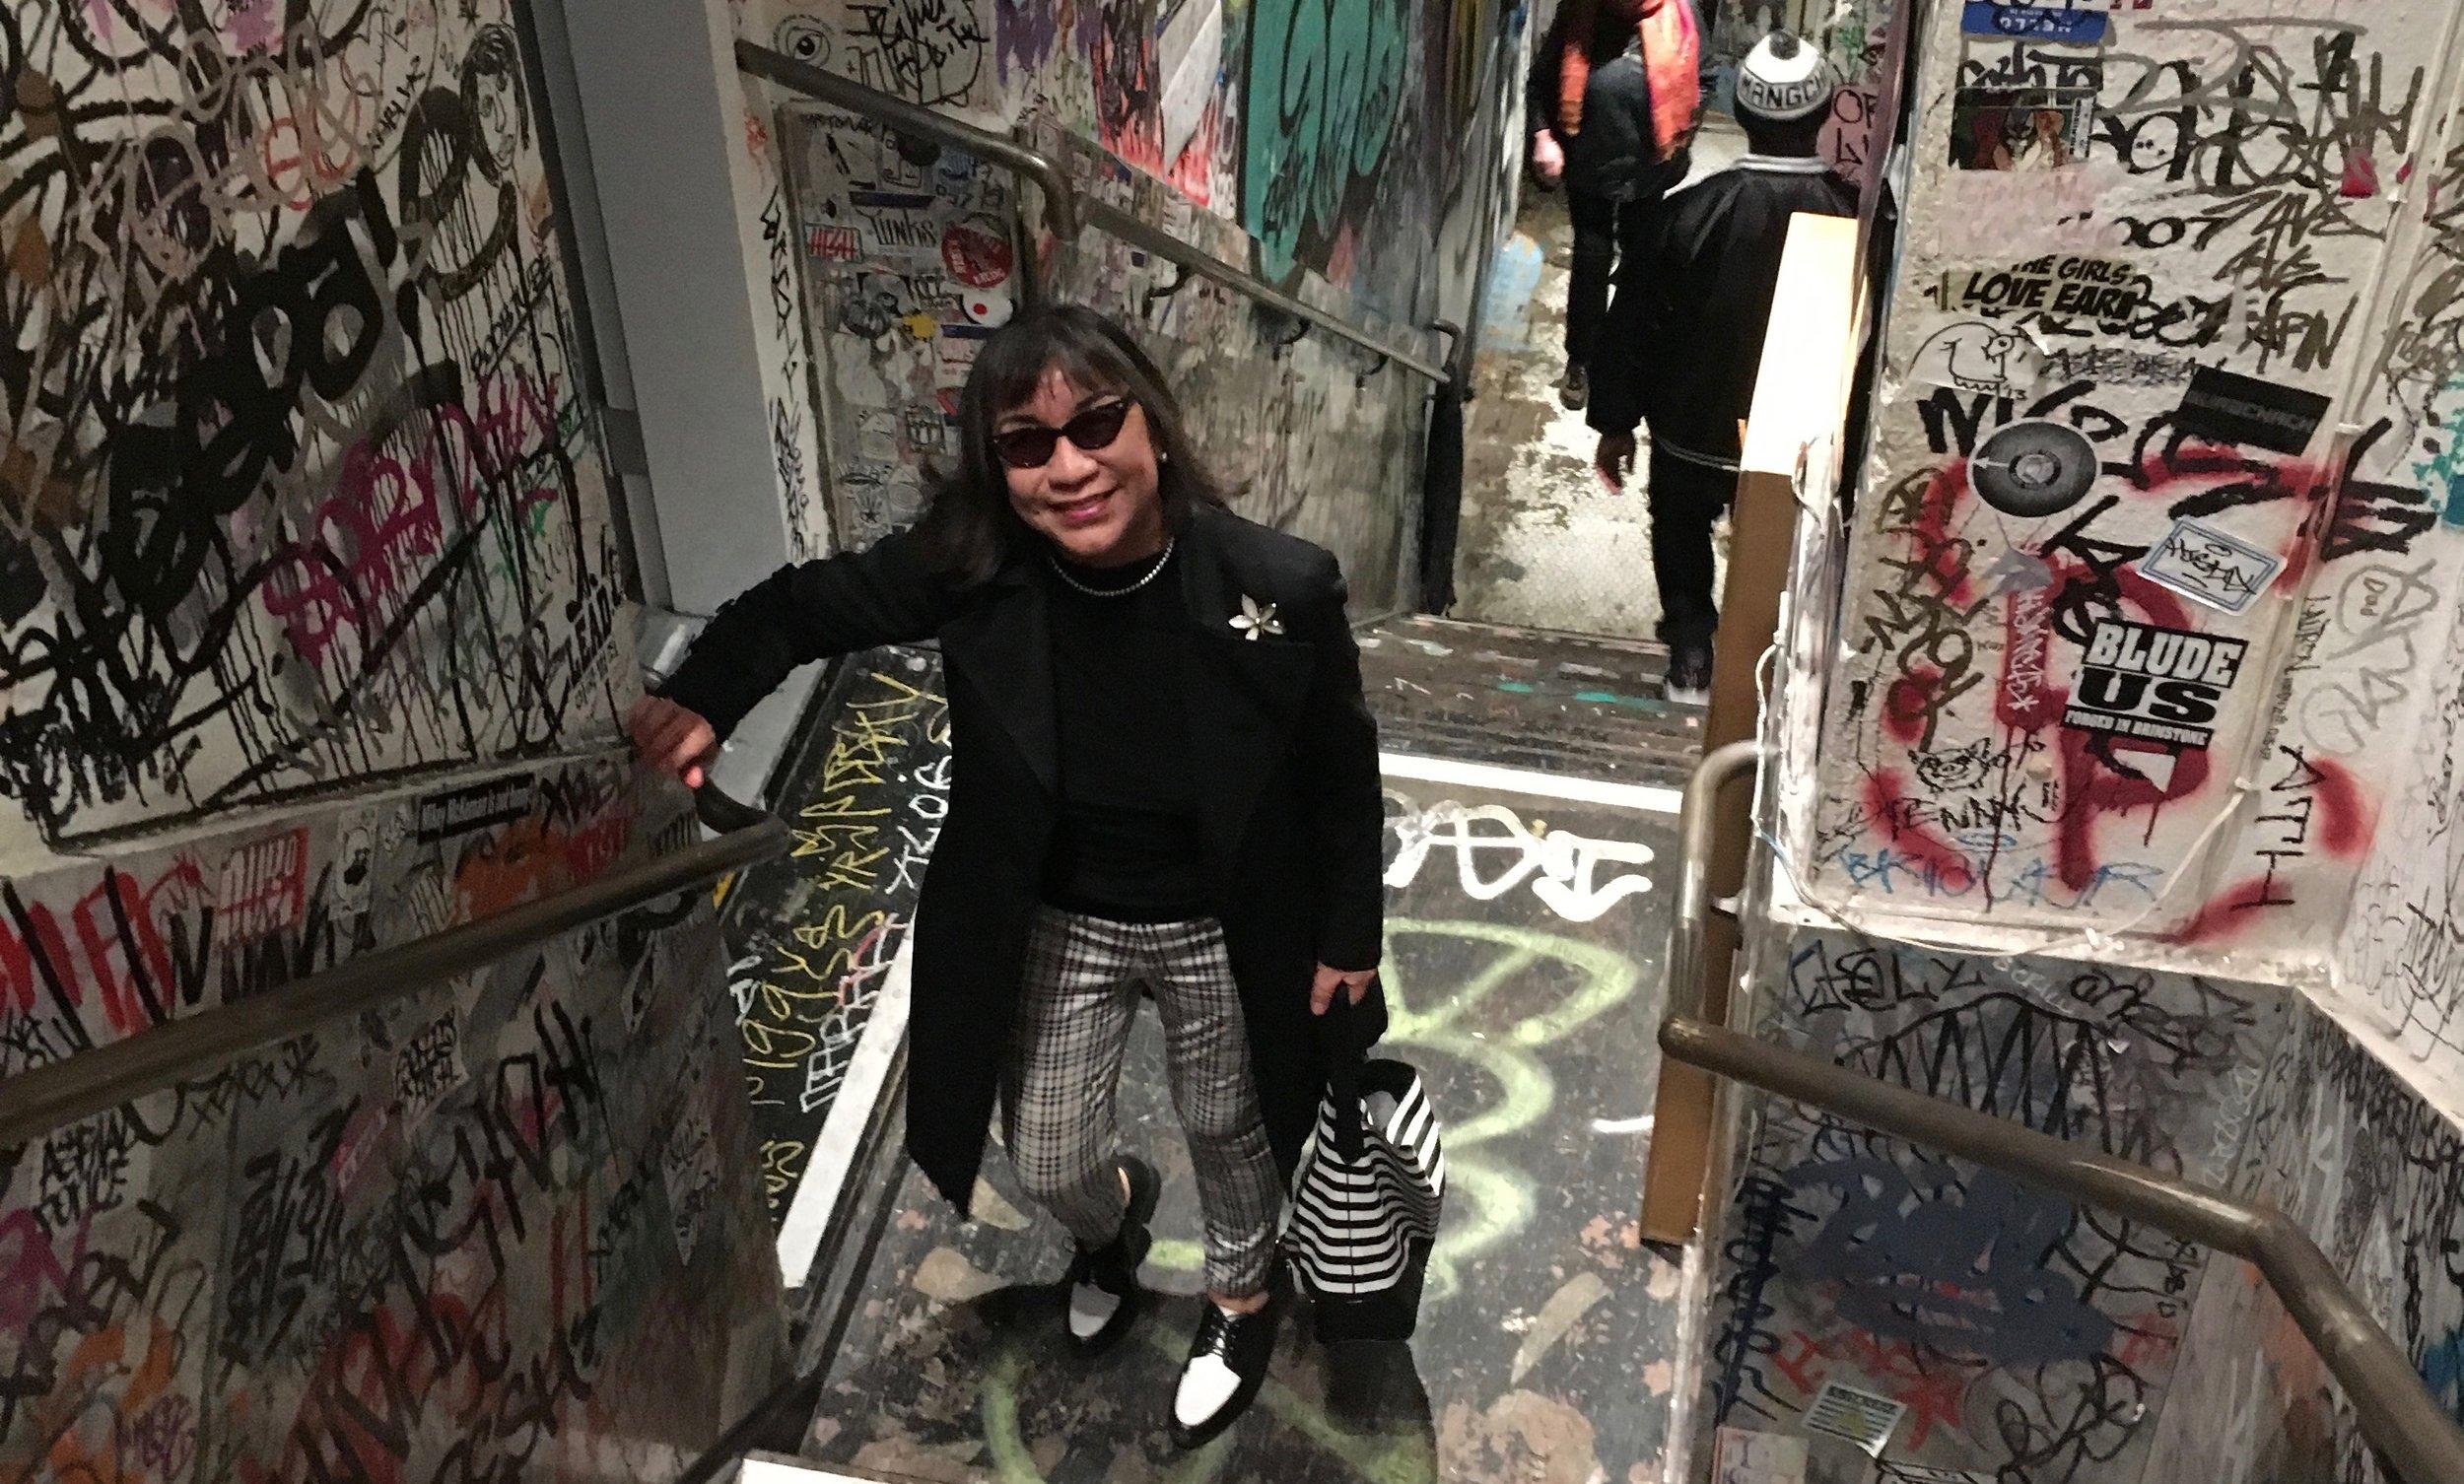 lorraine garcía-nakata, luggage store gallery, sf, ca., 2018